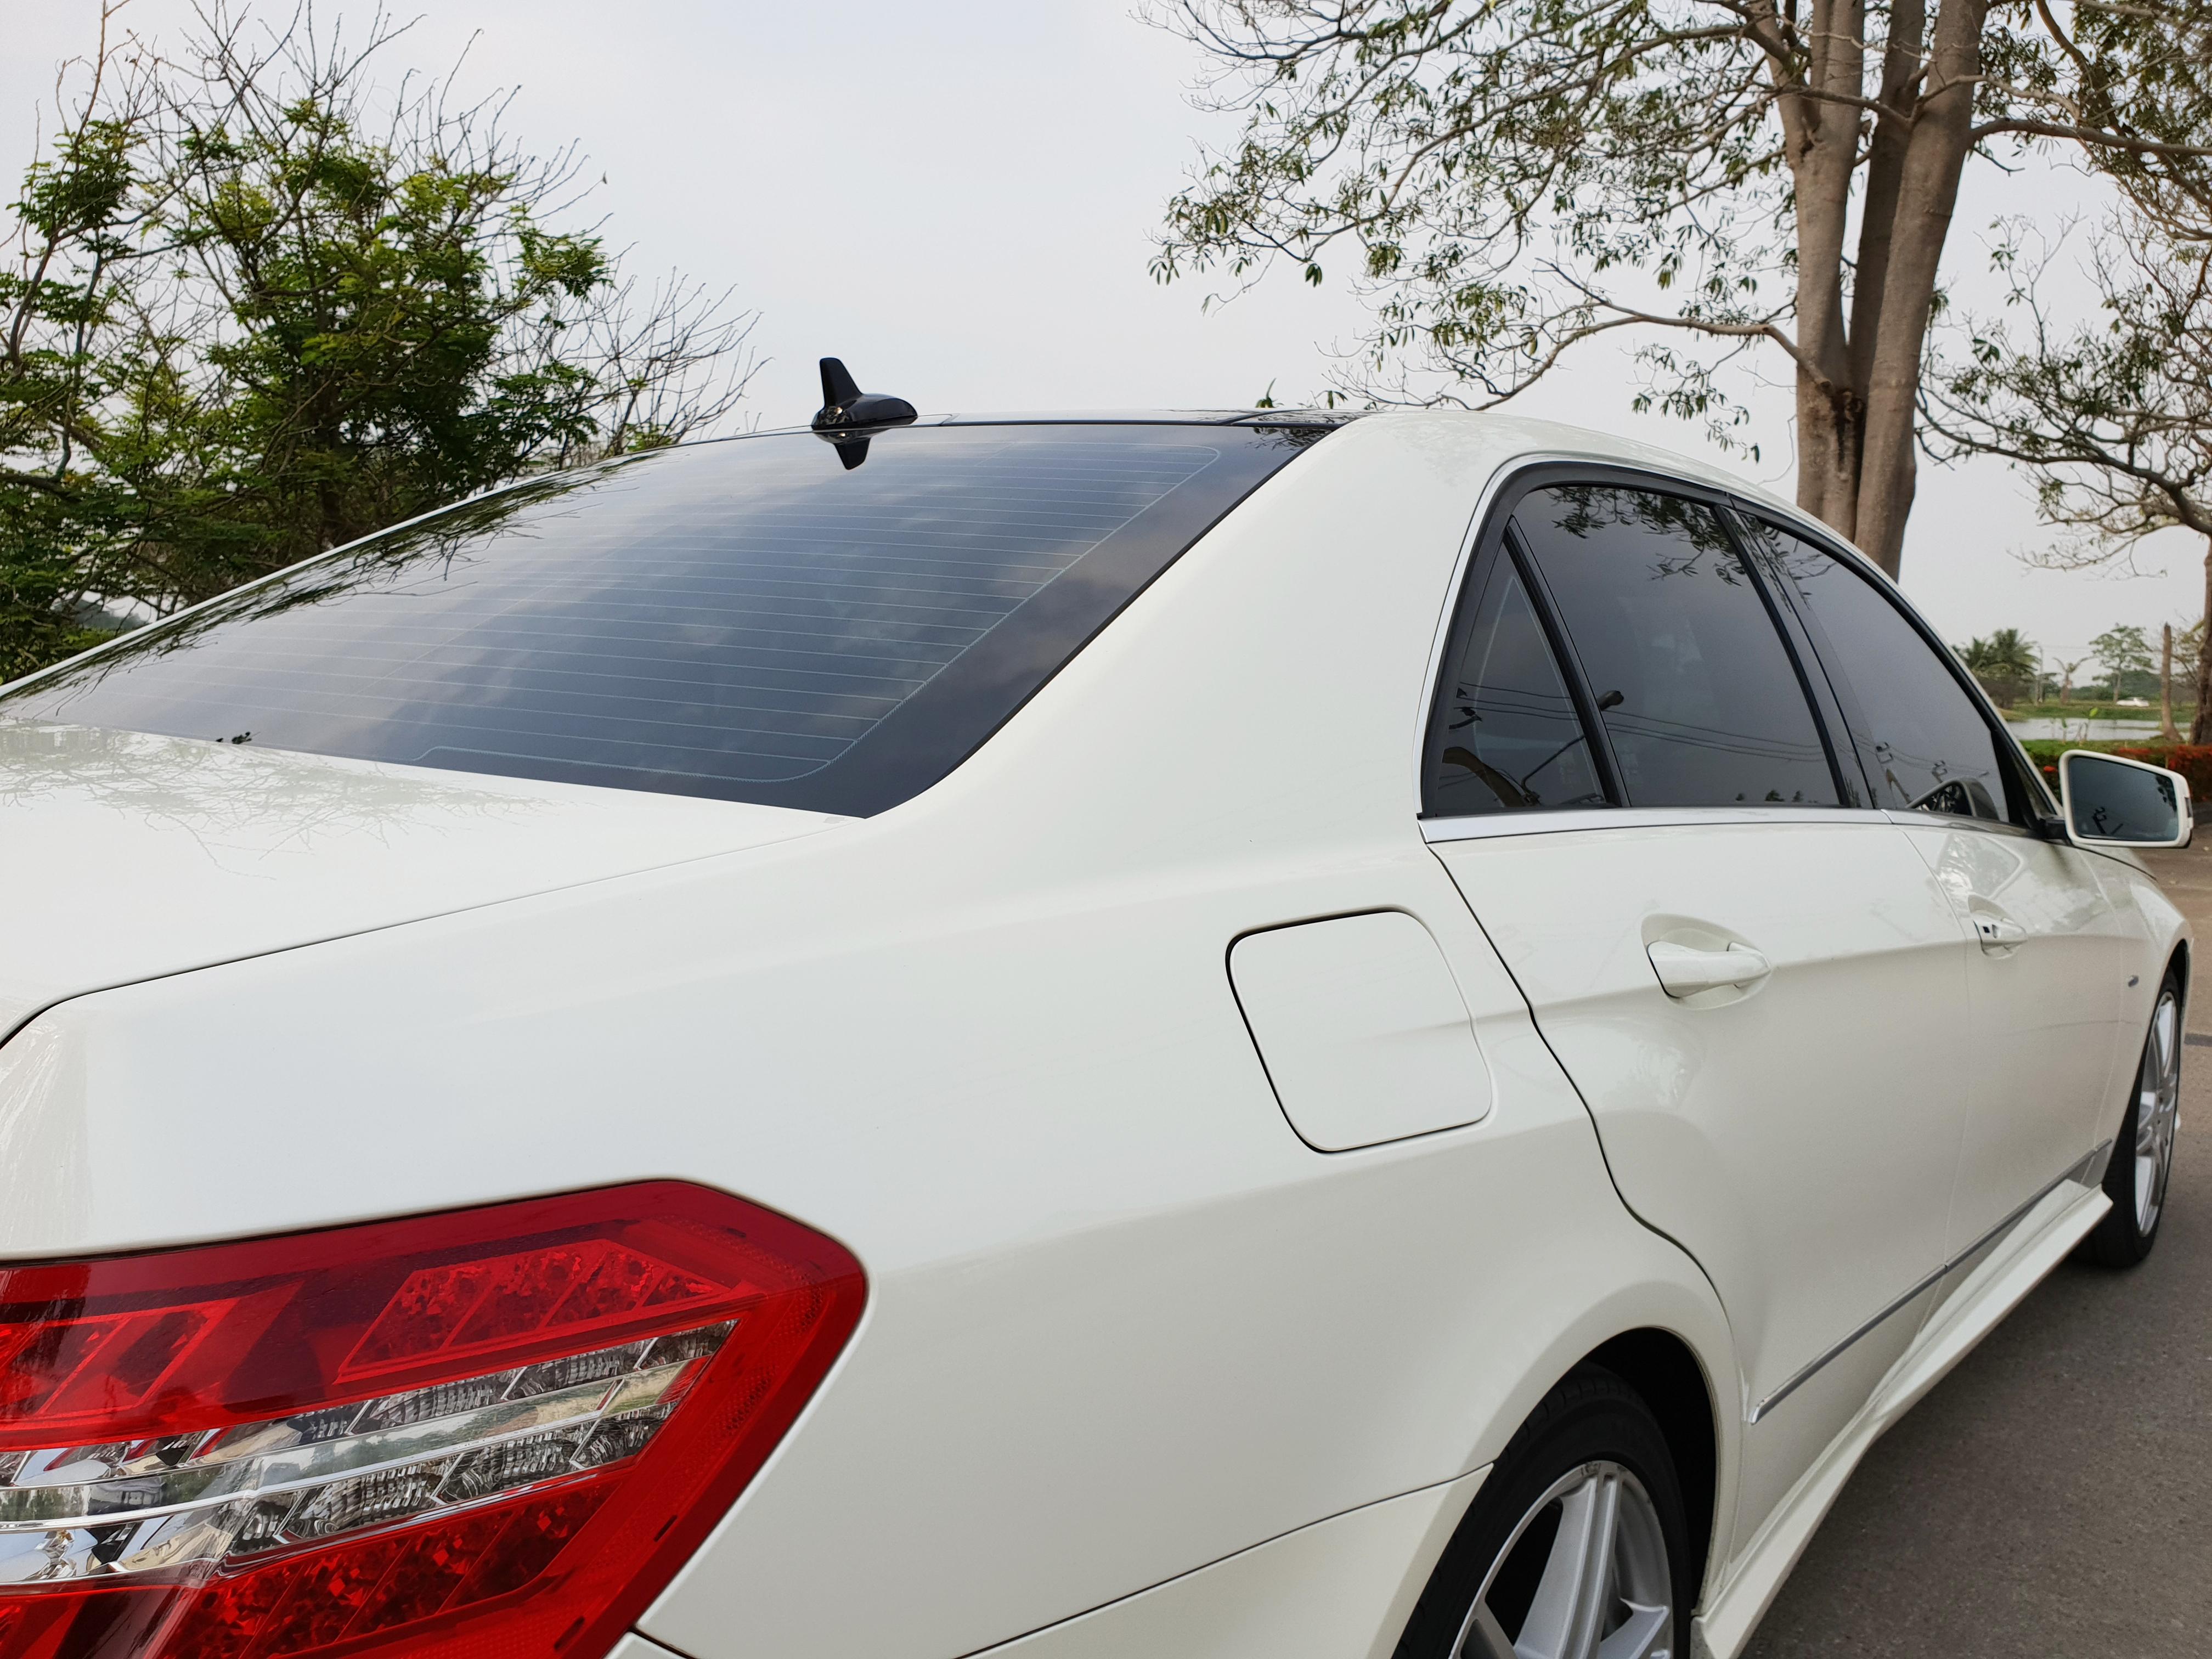 Benz E Class with Kontrast